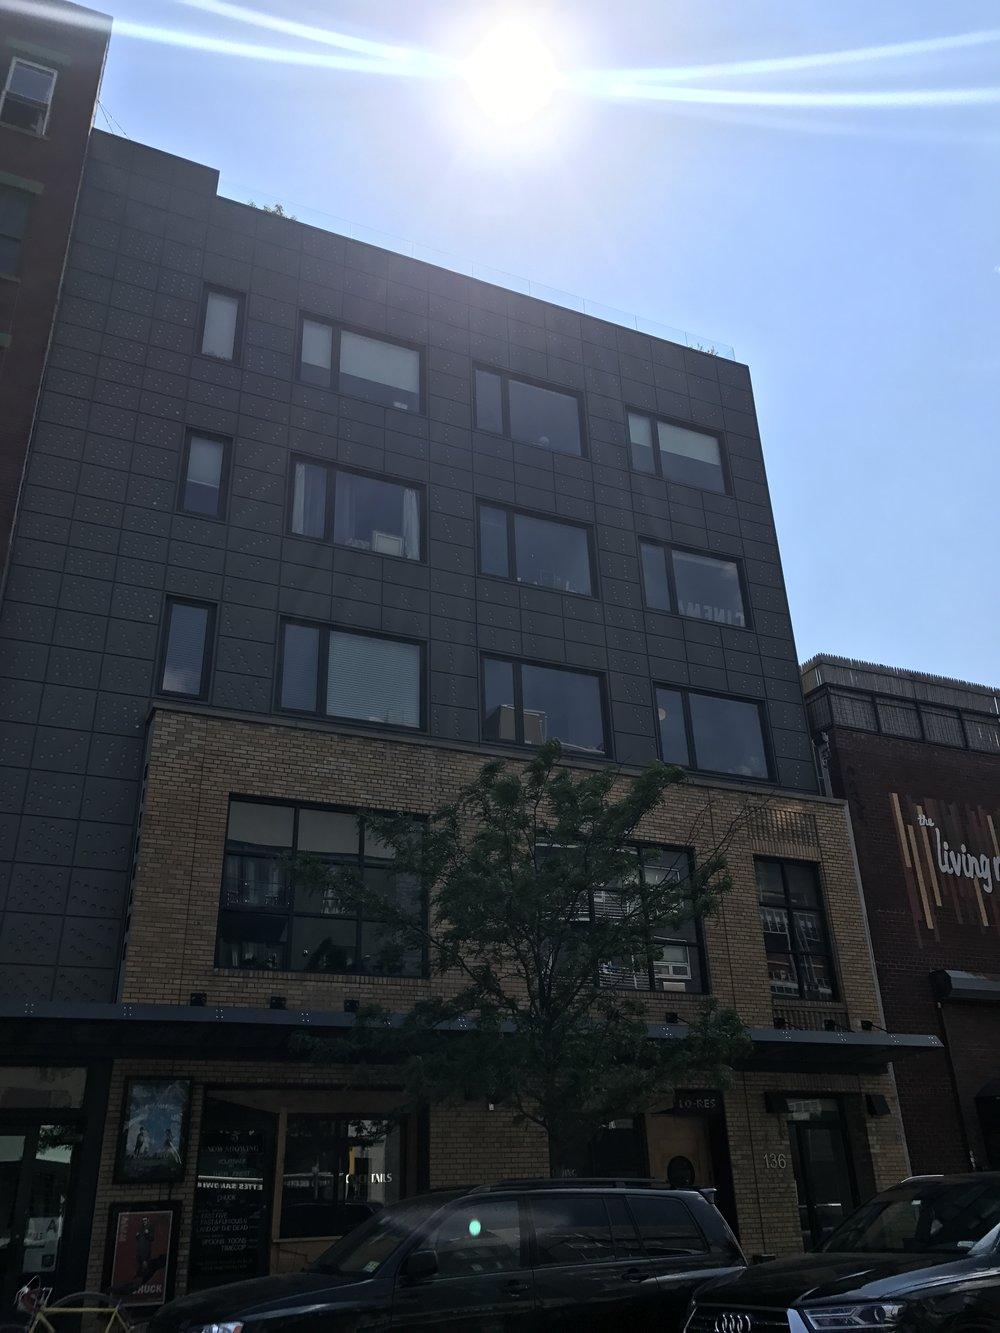 136 Metropolitan Avenue - Caliper Architecture PC5 story mixed use building